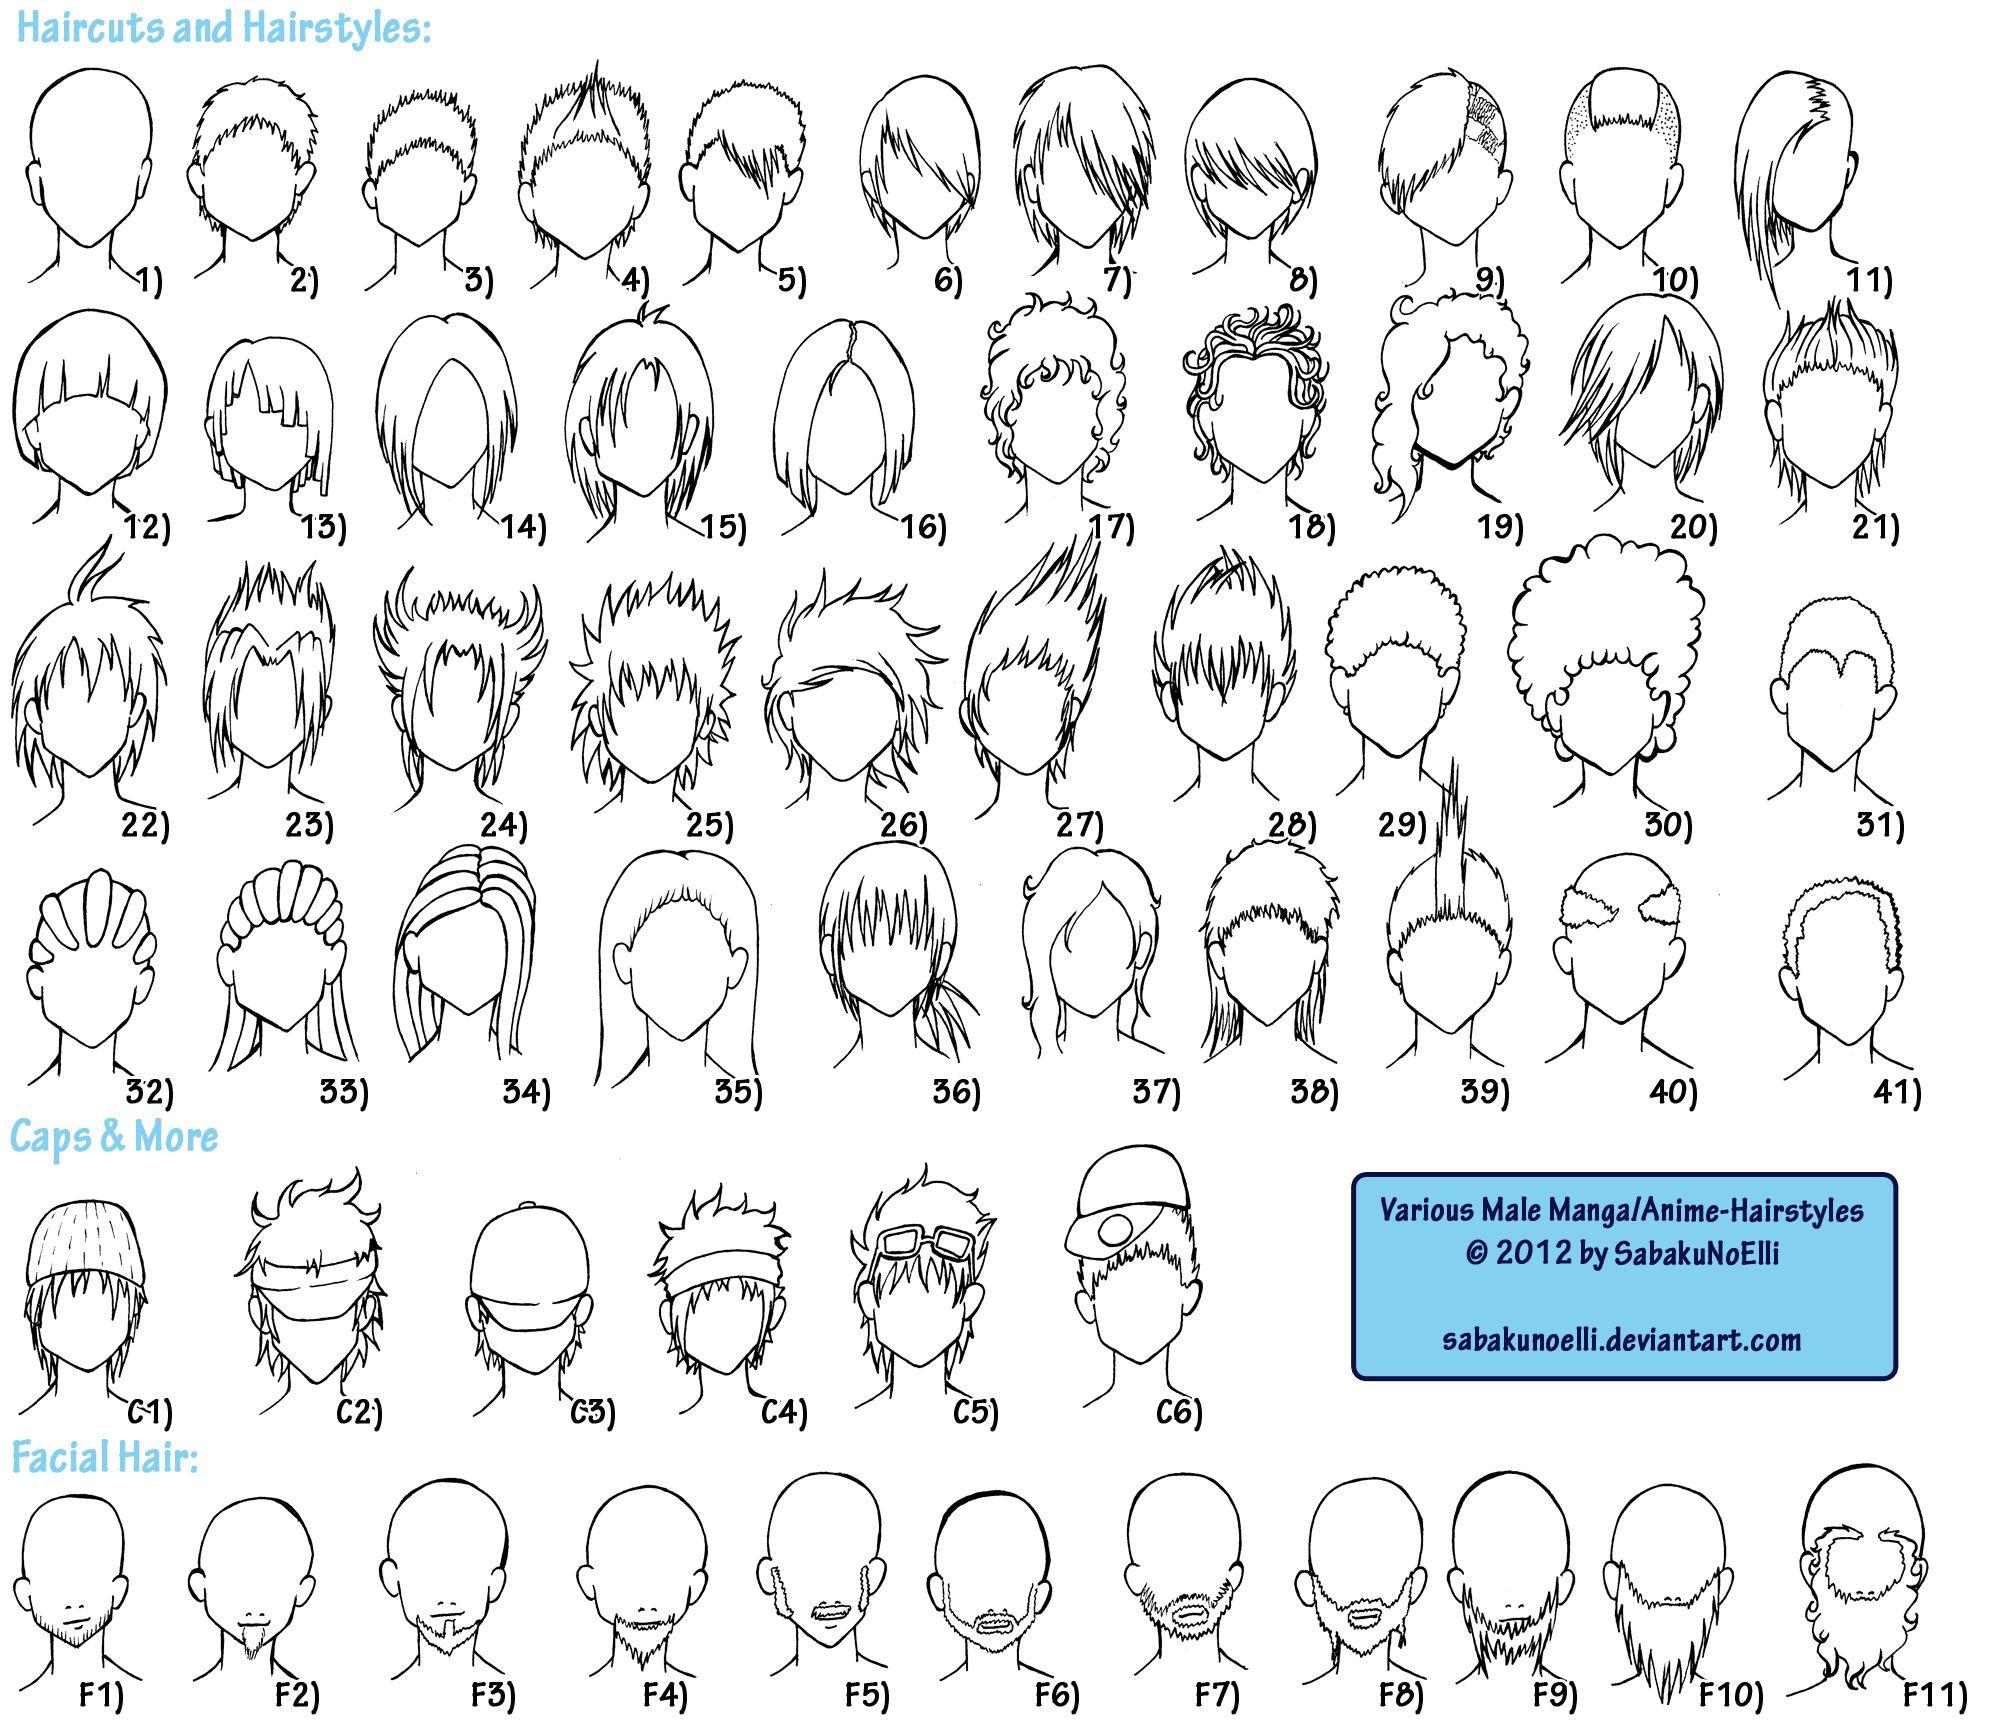 various male anime+manga hairstyles by =sabakunoelli on